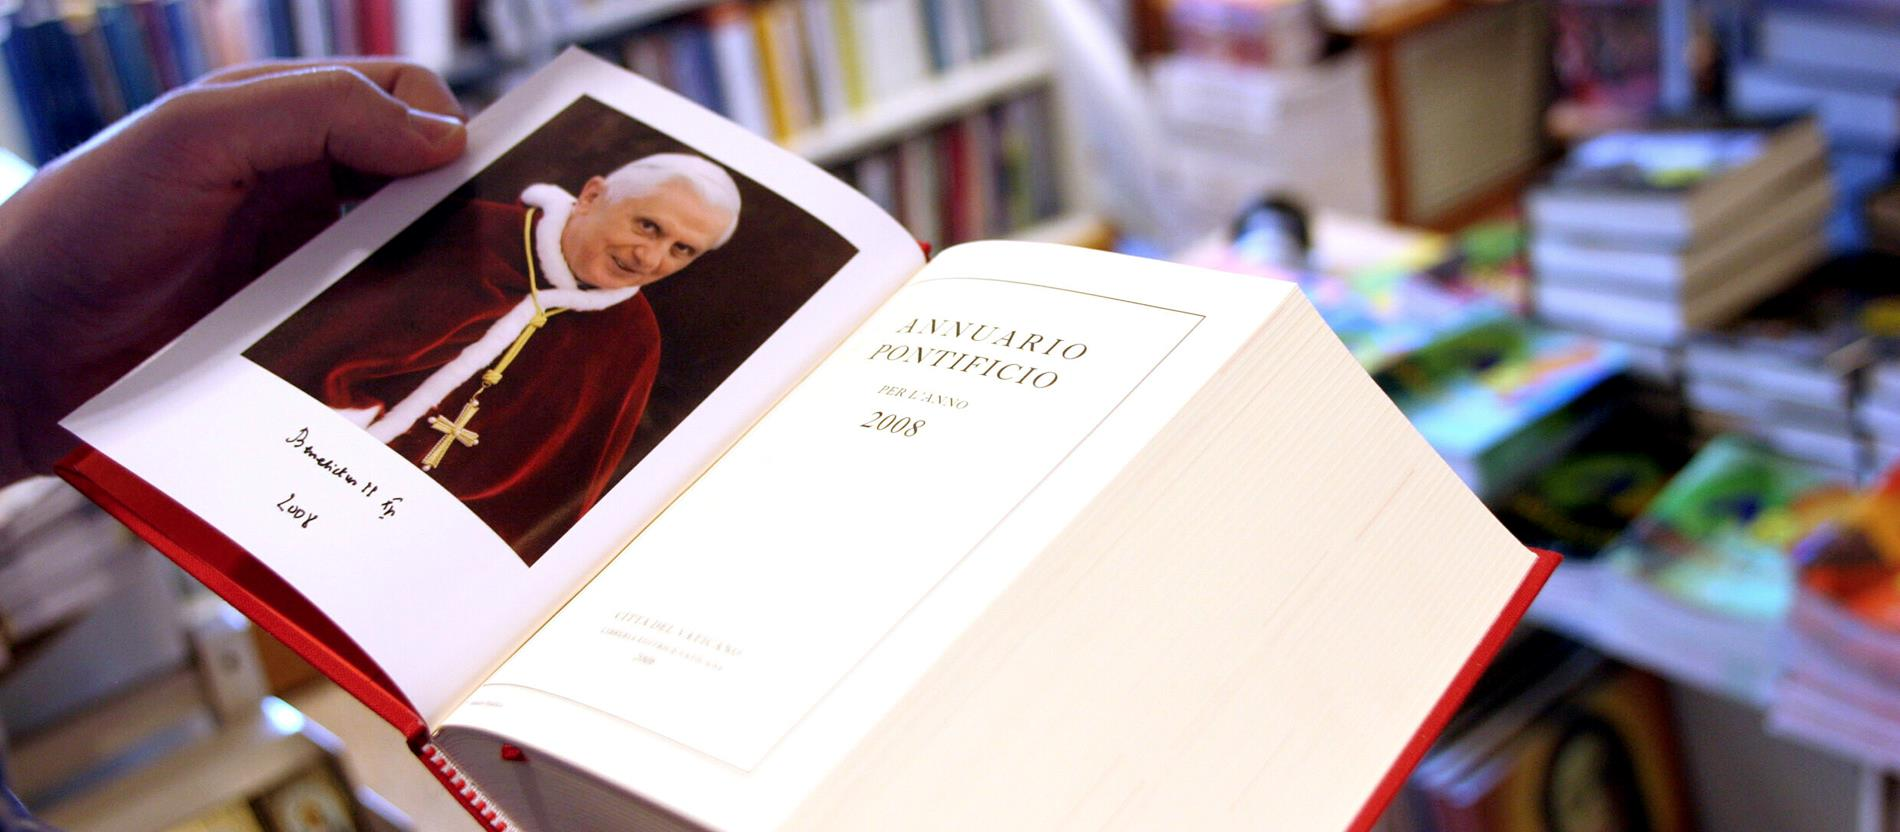 Katholisch Wortbedeutung